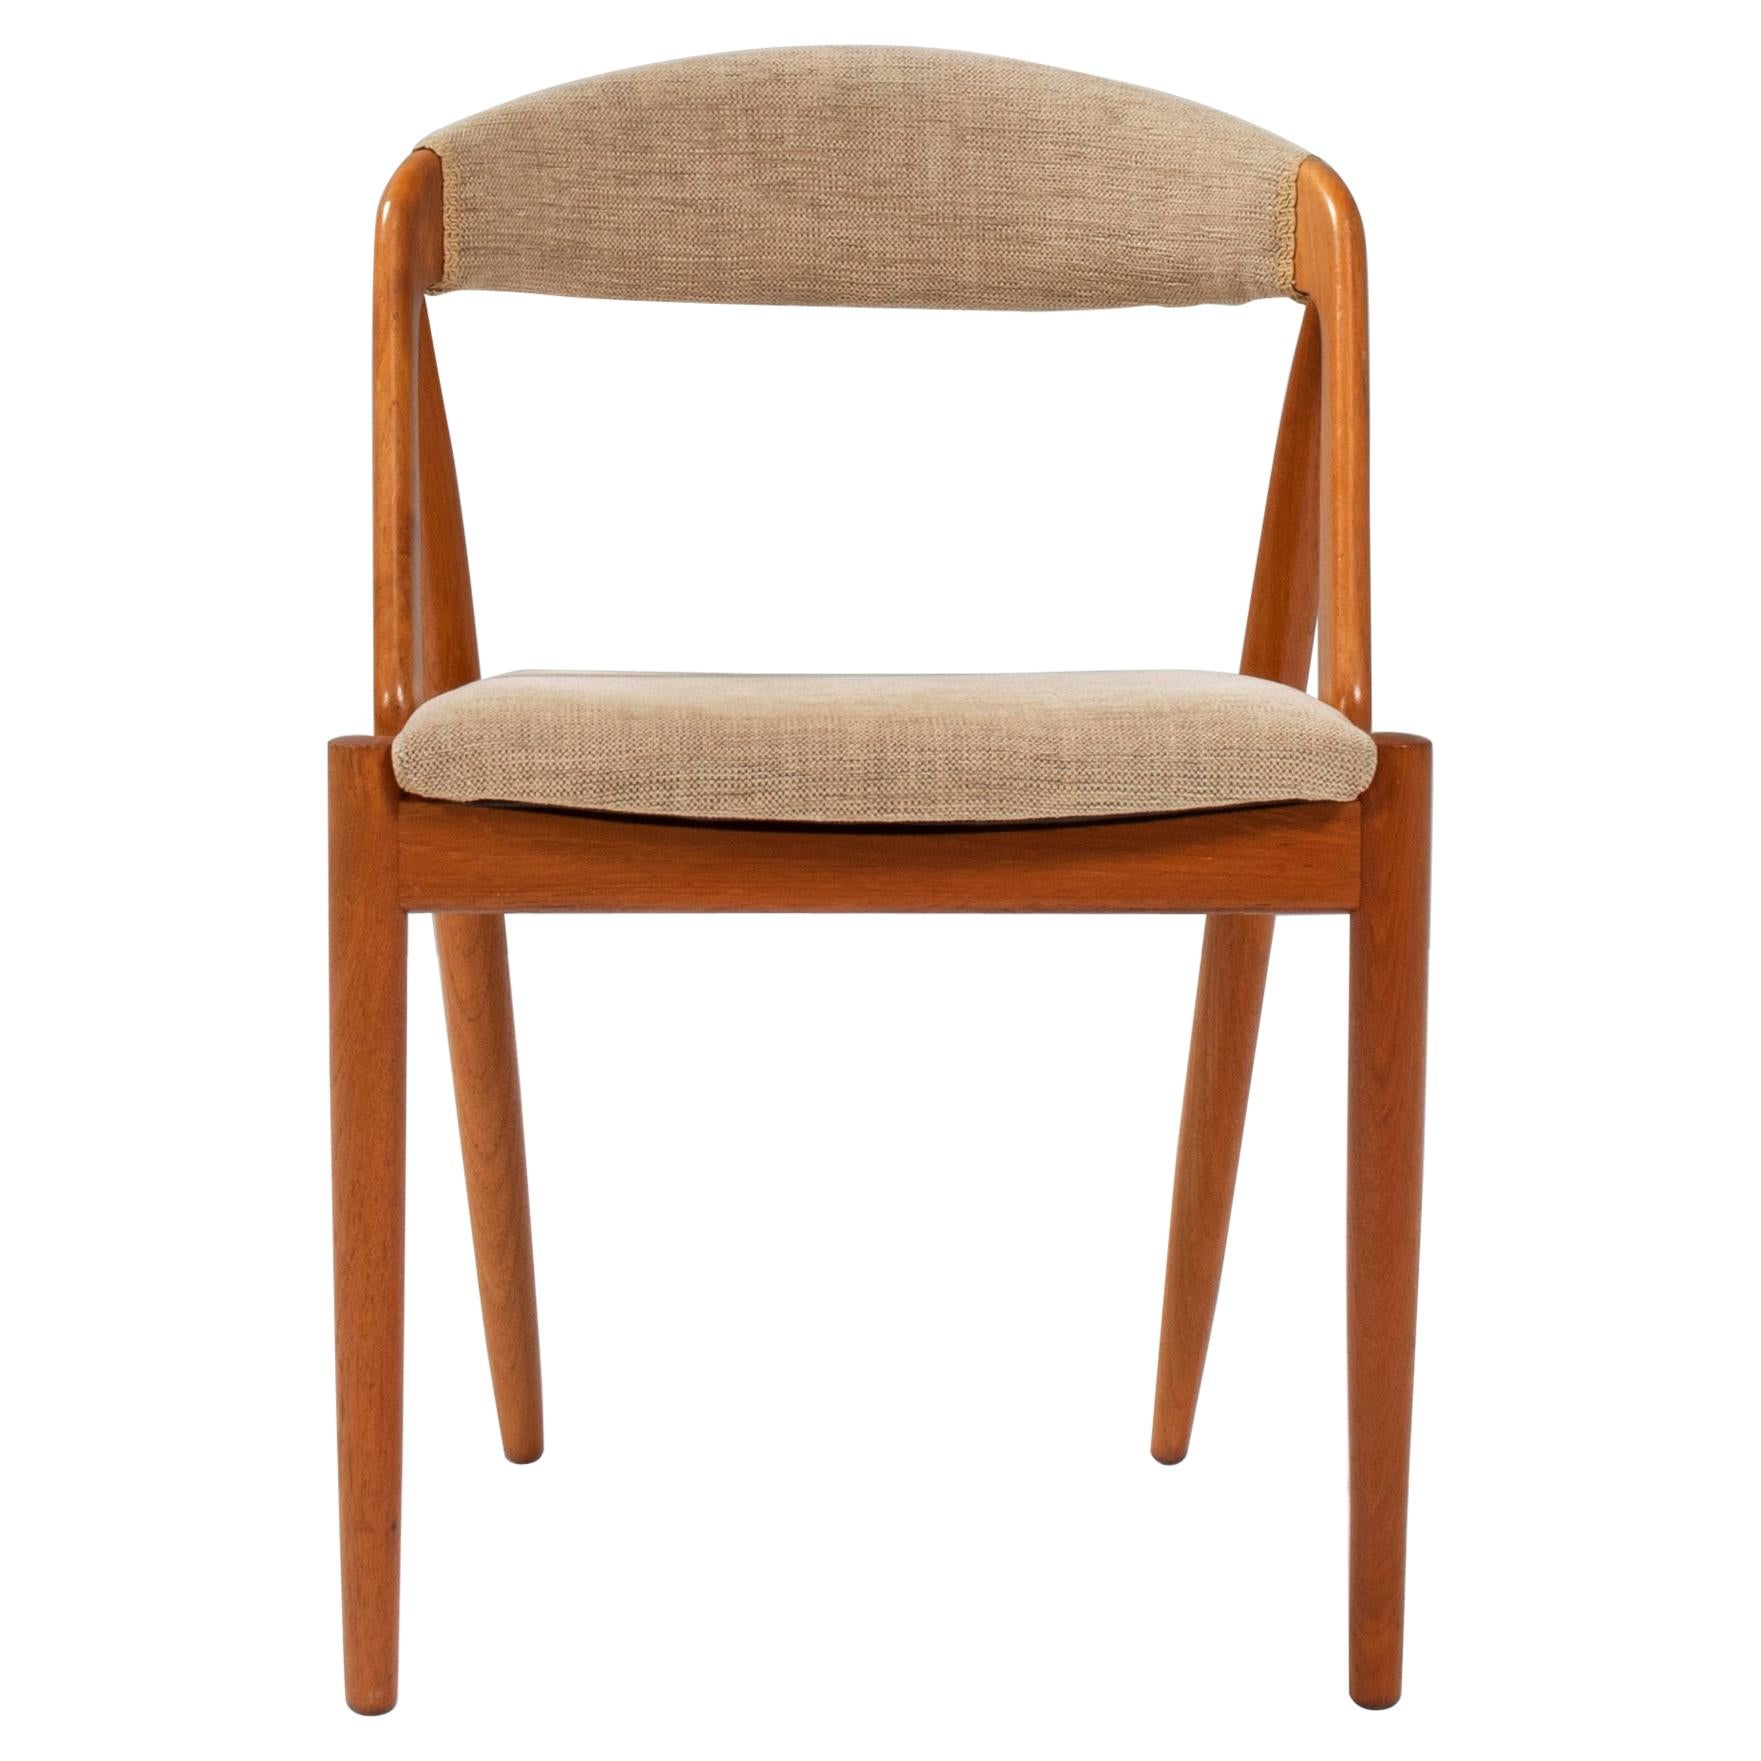 1960's Kai Kristiansen for Schou Andersen Model 31 Dining Chair